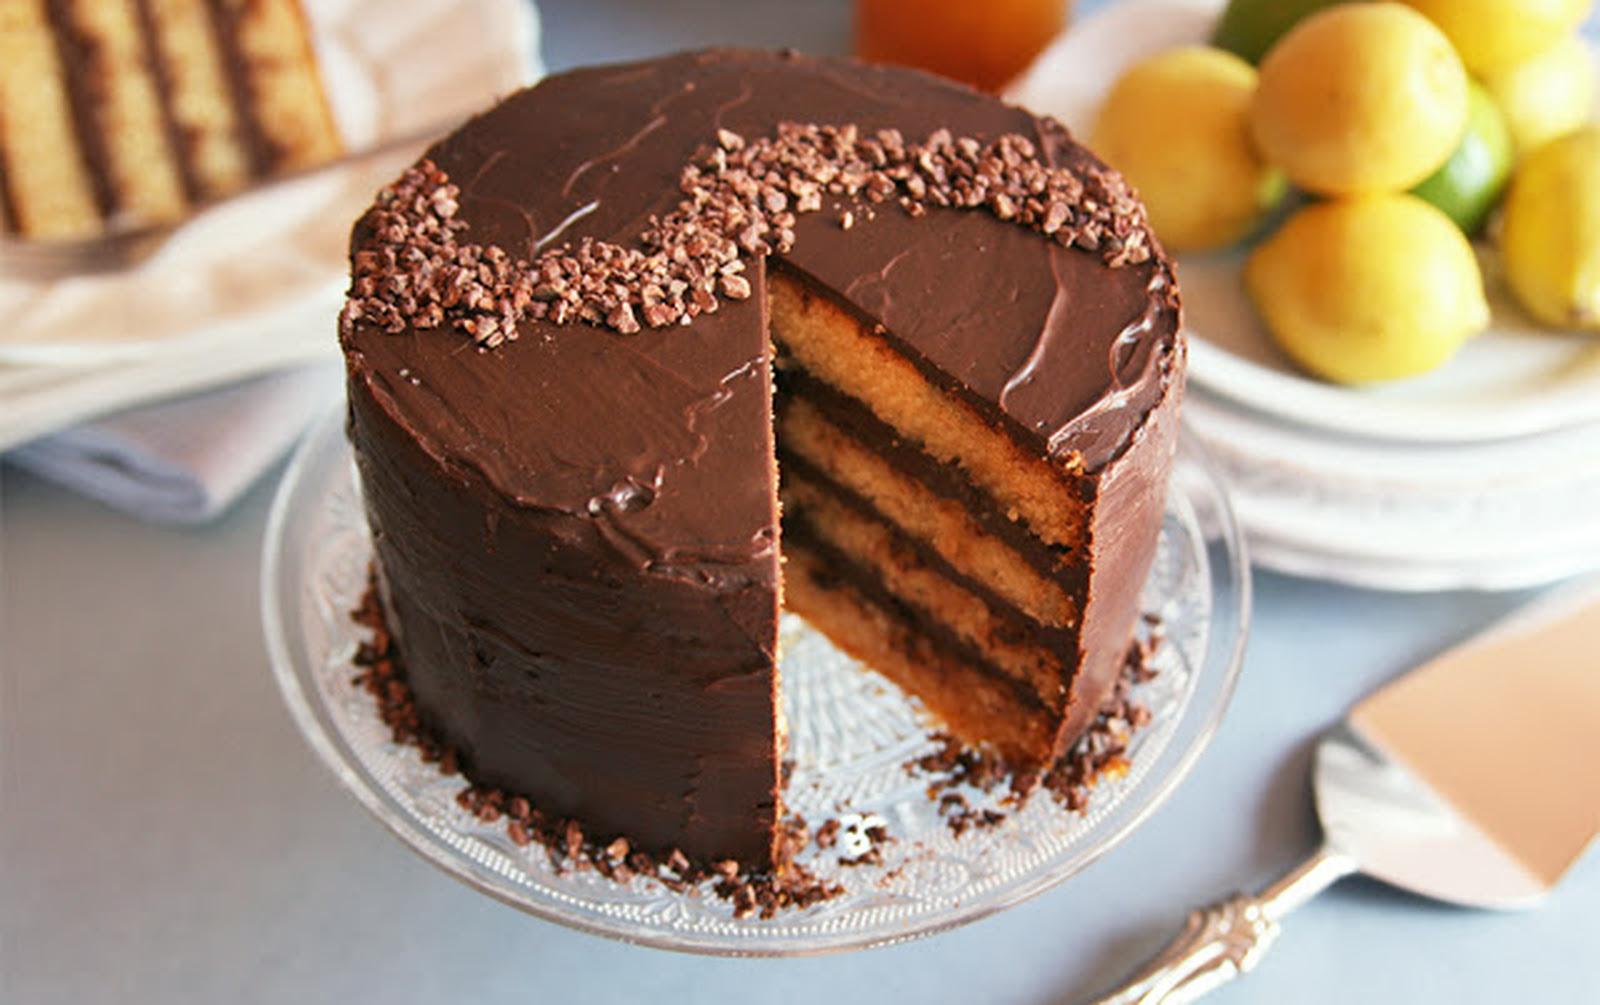 Lemon Cake With Dark Chocolate Ganache [Vegan]